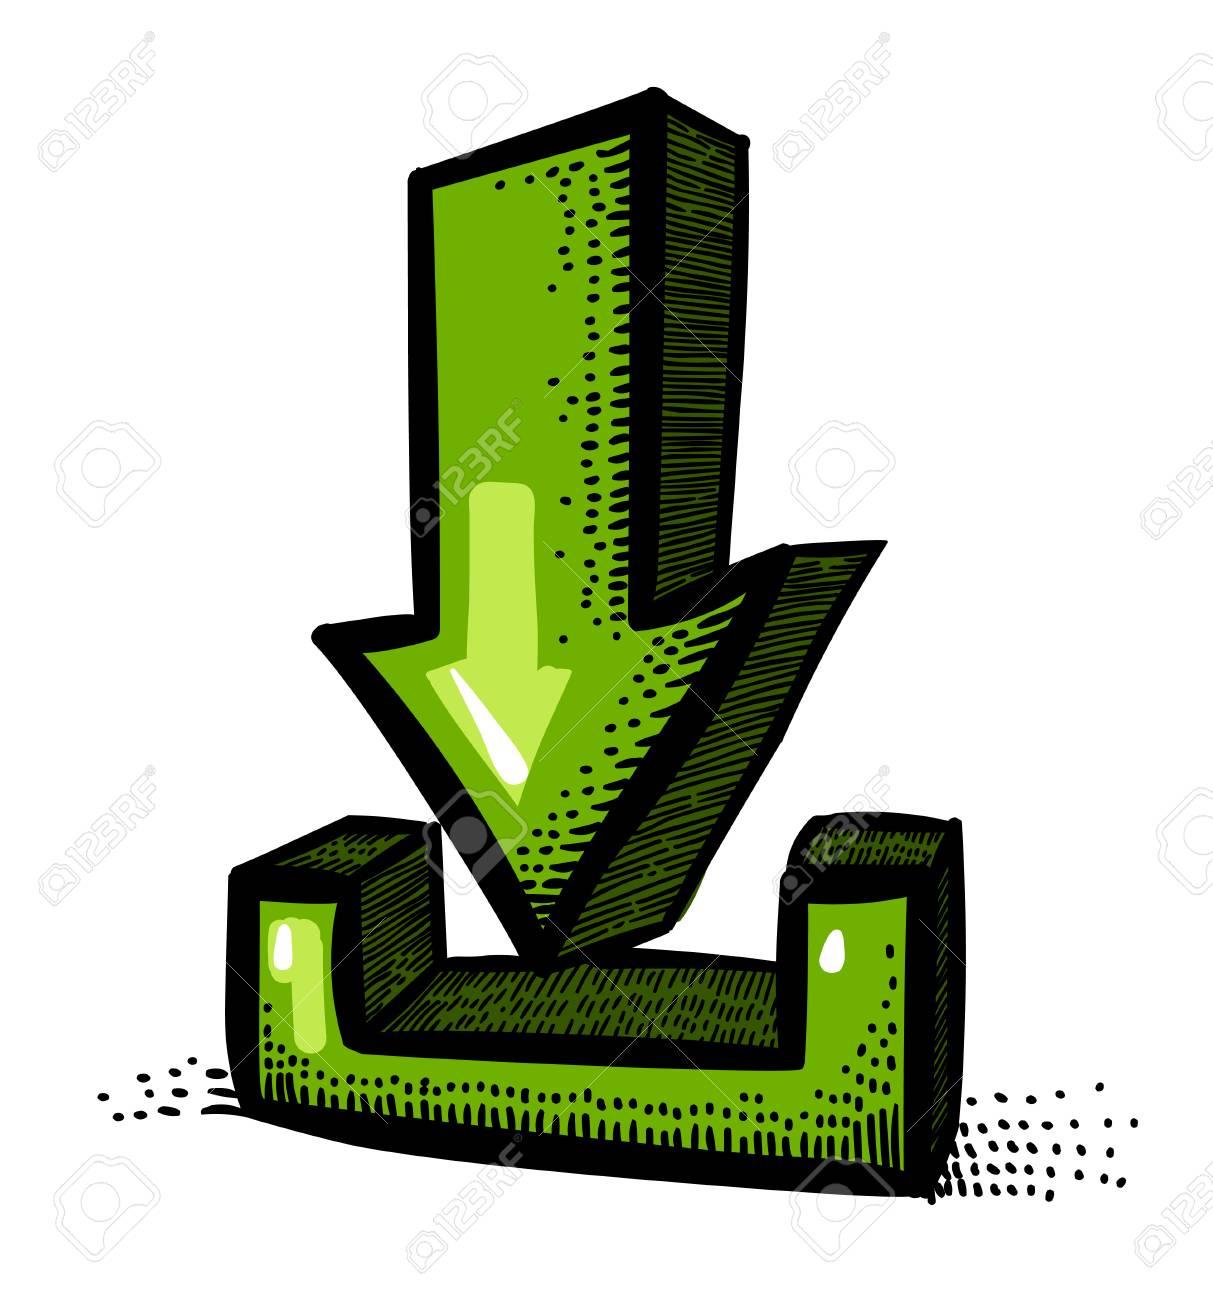 cartoon image of torrent icon arrow symbol royalty free cliparts rh 123rf com Wing Set Vector Torrents vector torrent download